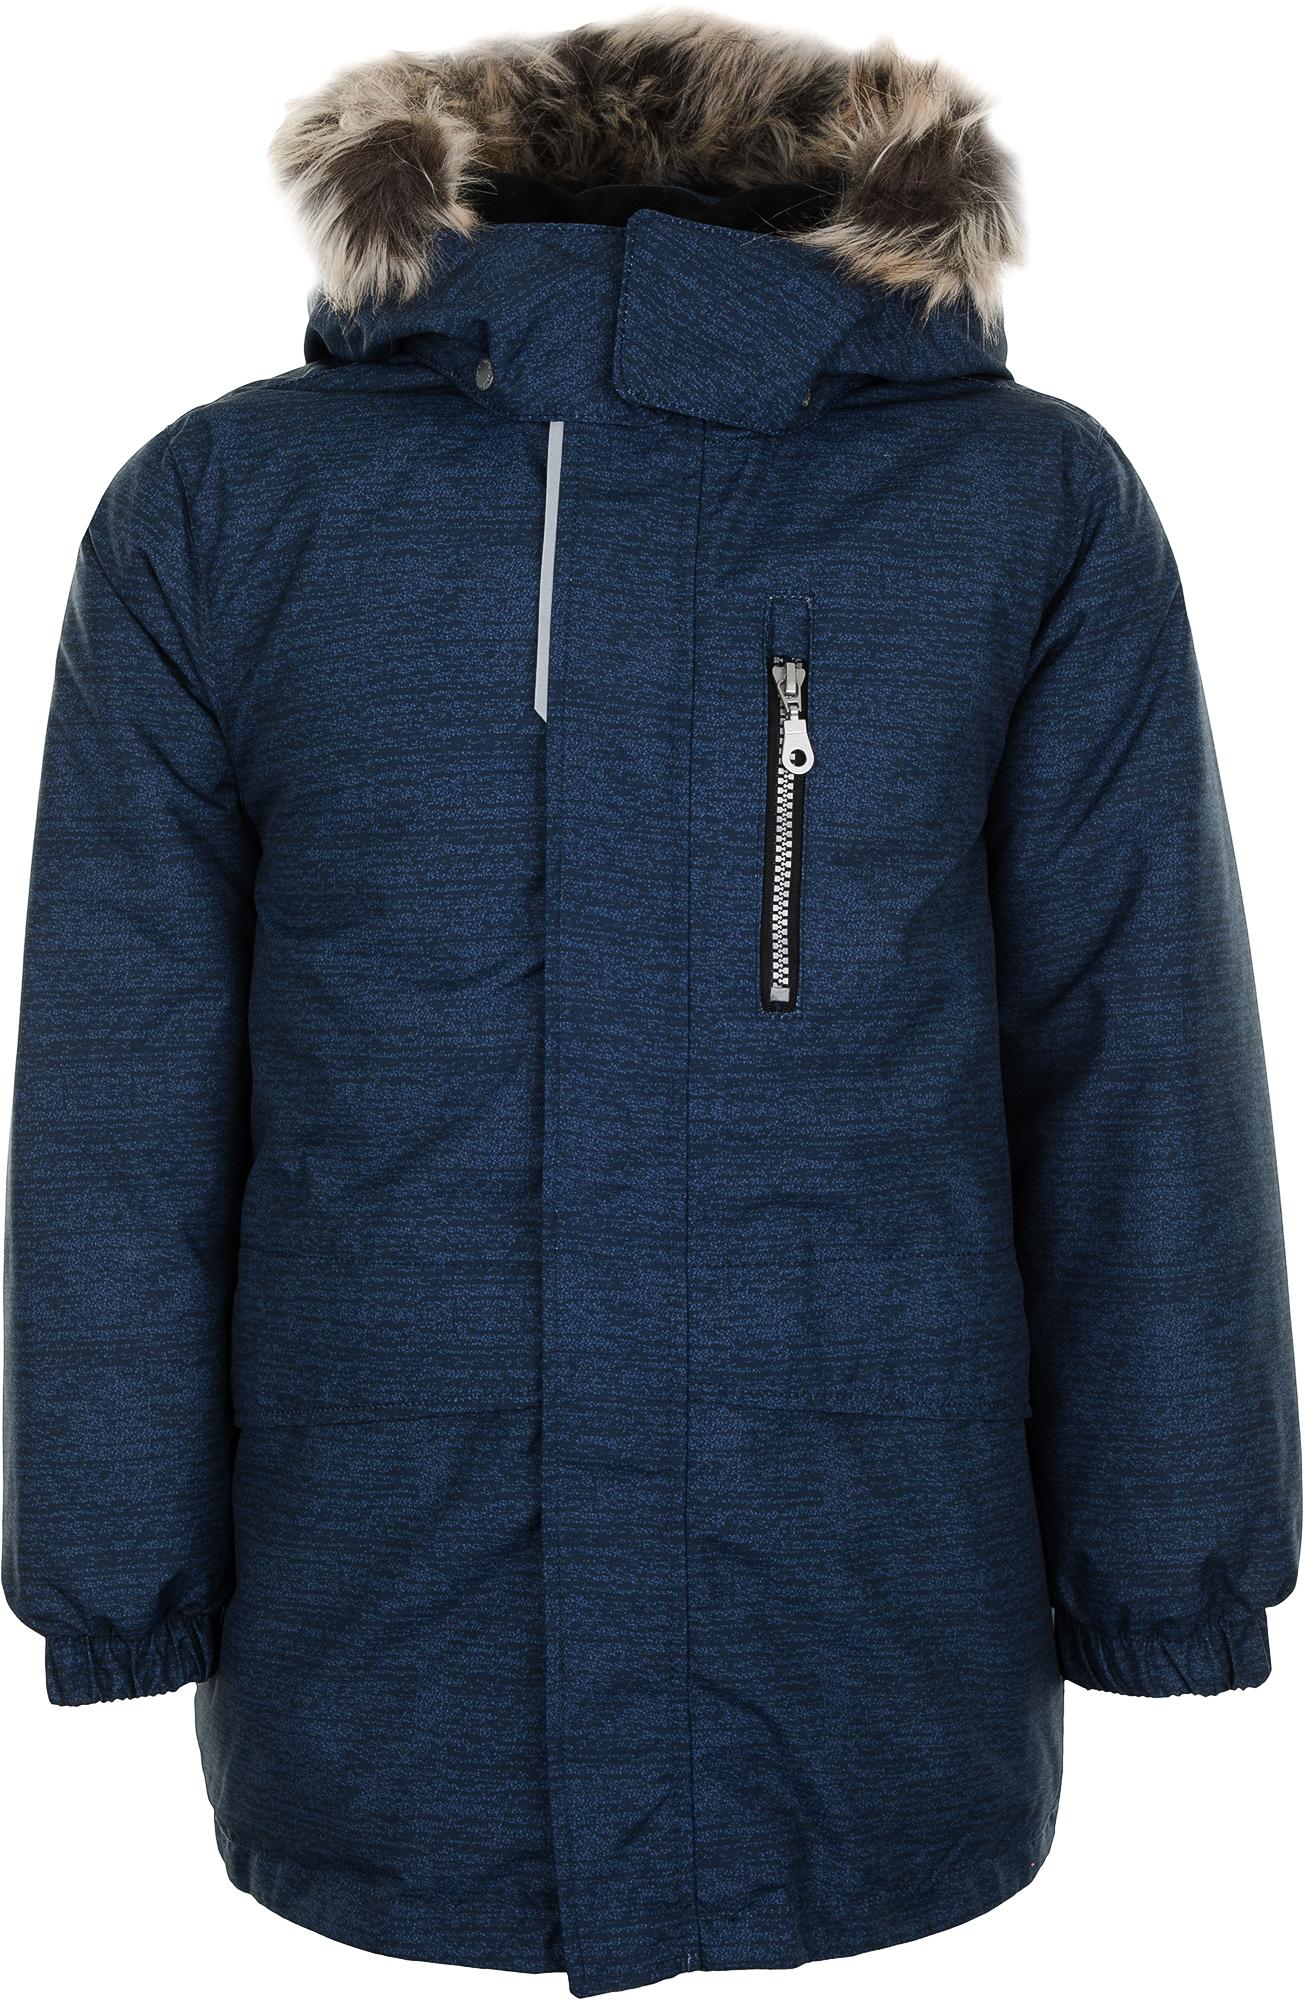 Lassie Куртка утепленная для мальчиков LASSIE Yanis, размер 140 цена